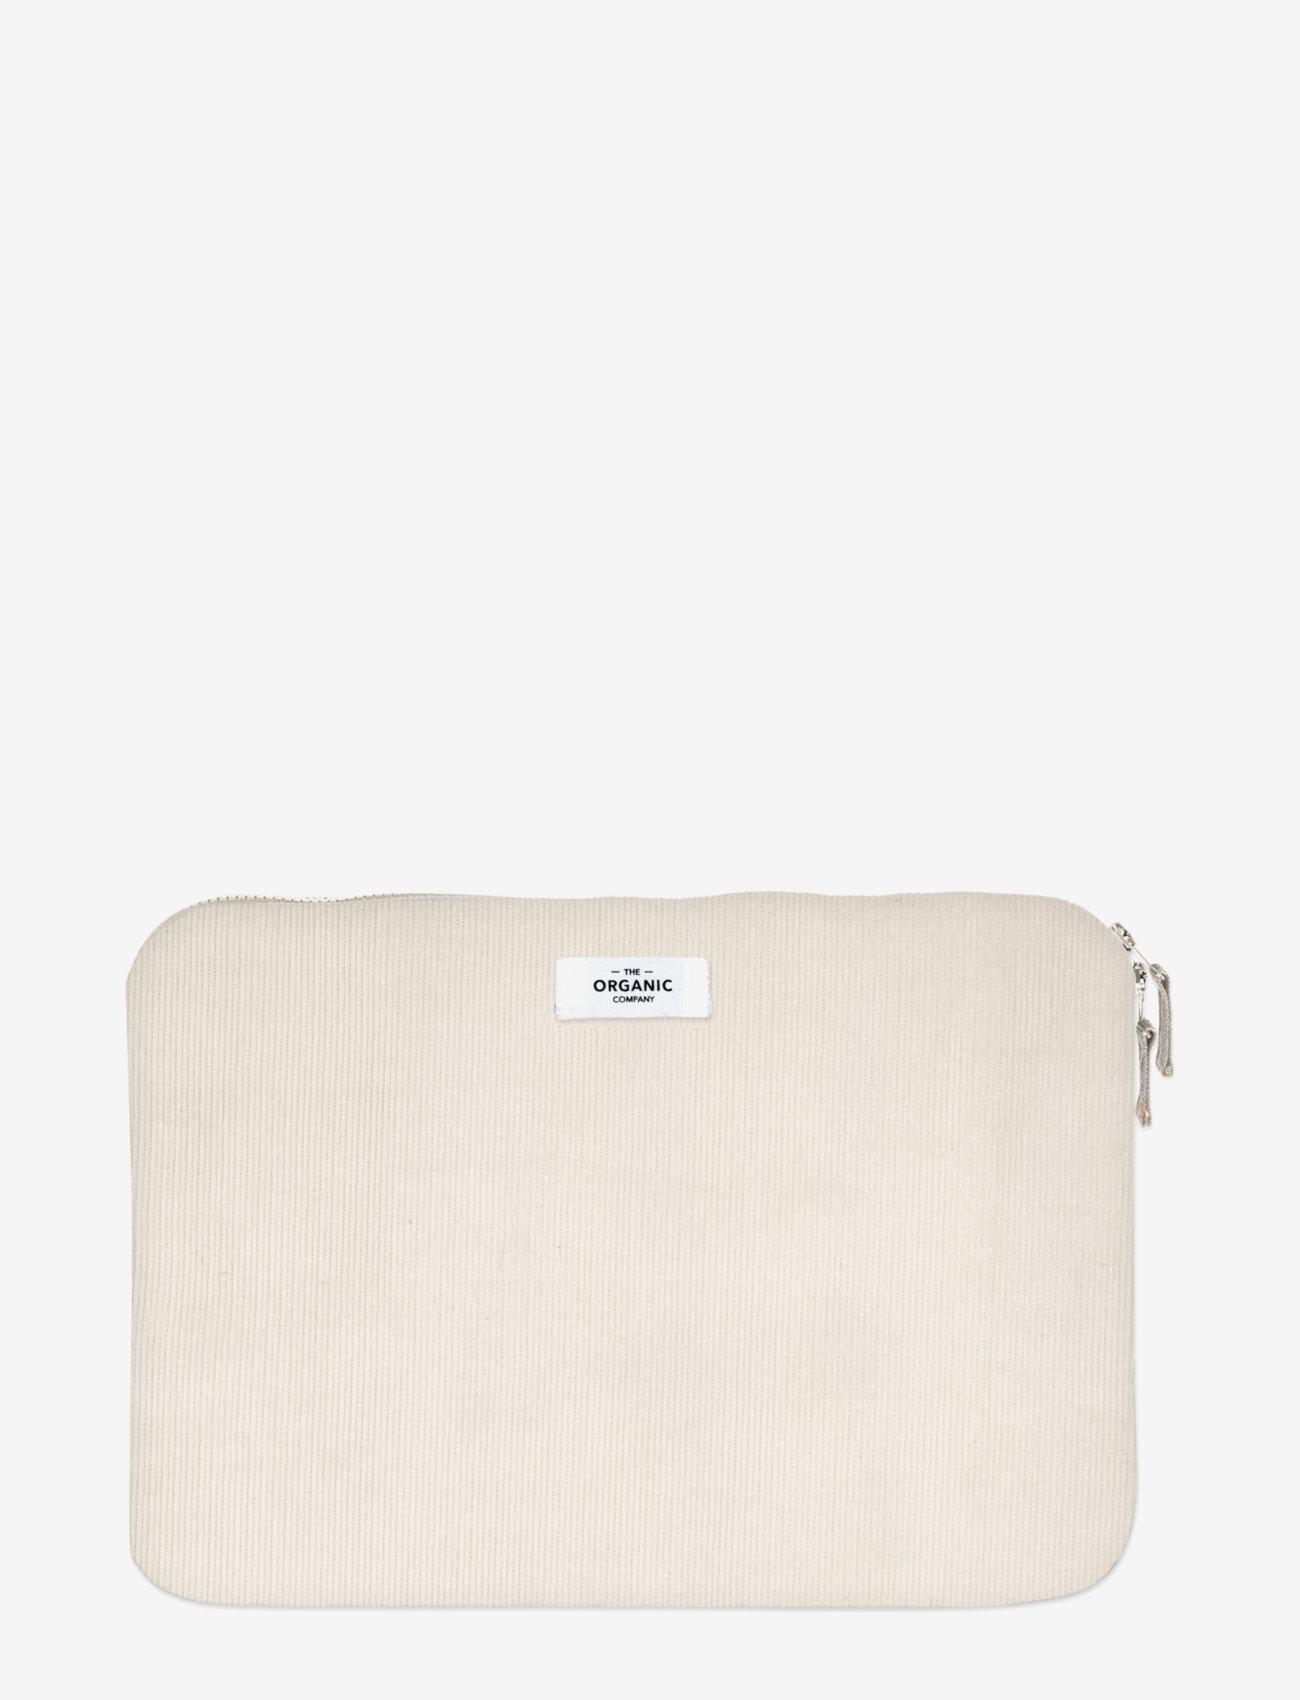 "The Organic Company - Laptop Sleeve 11"" - tassen - 202 stone - 0"